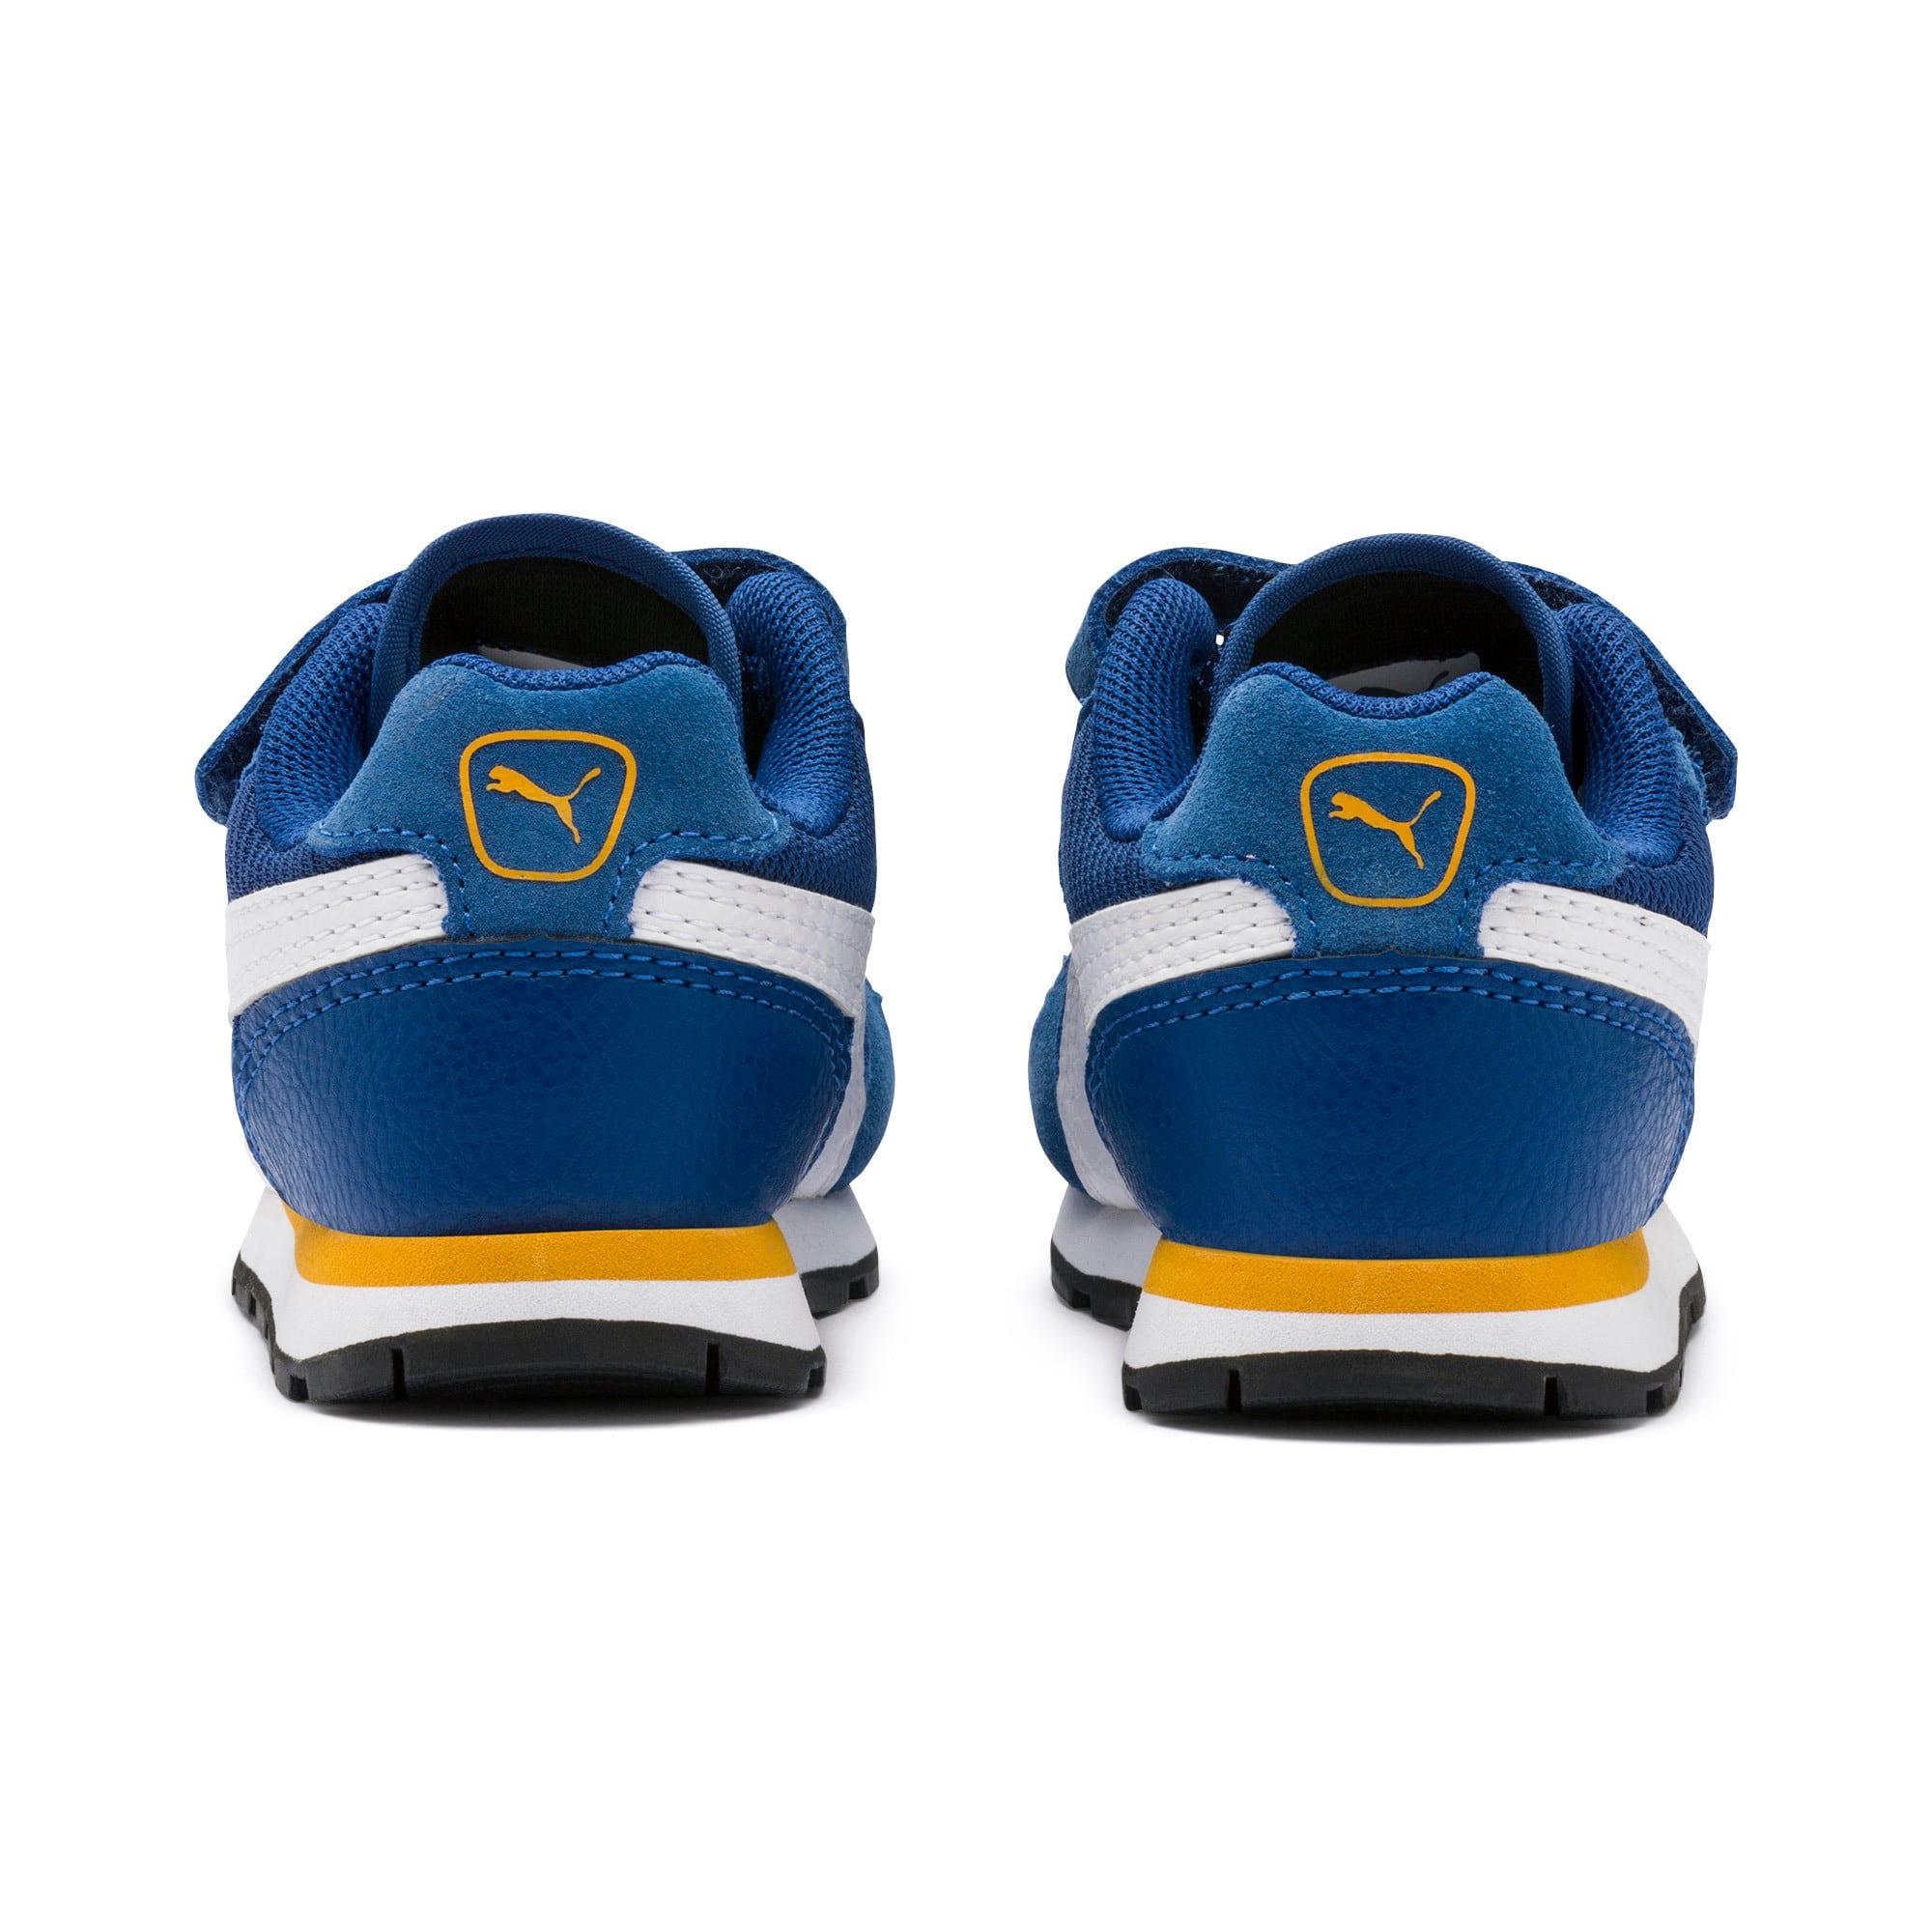 Thumbnail 3 of Vista Toddler Shoes, Galaxy Blue-Puma White, medium